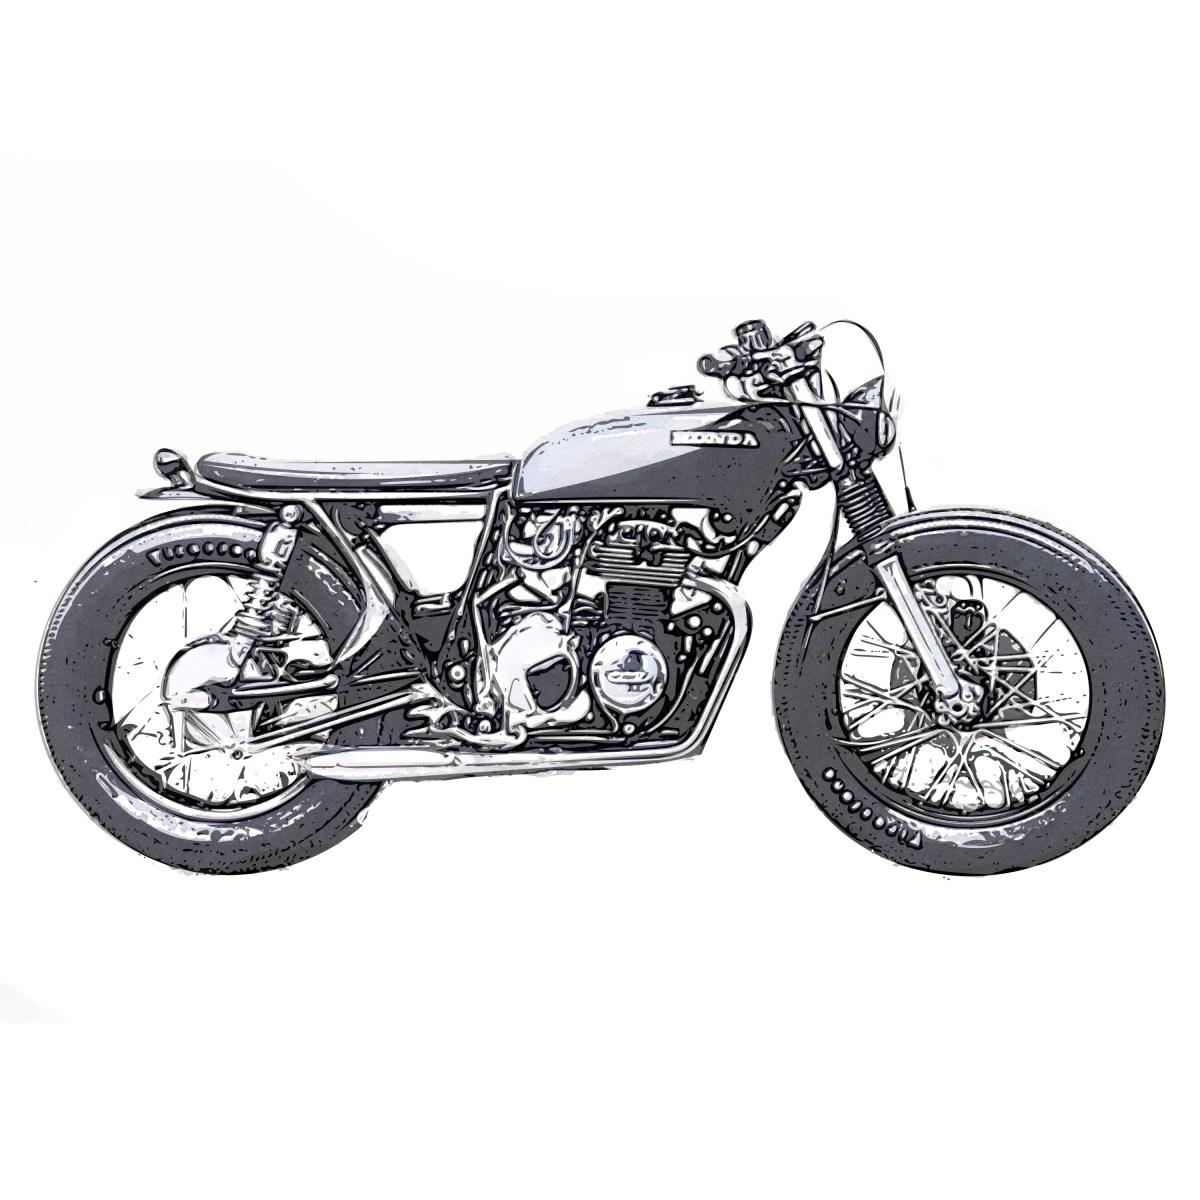 LAで流行しているモーターサイクルデザインの最新トレンド